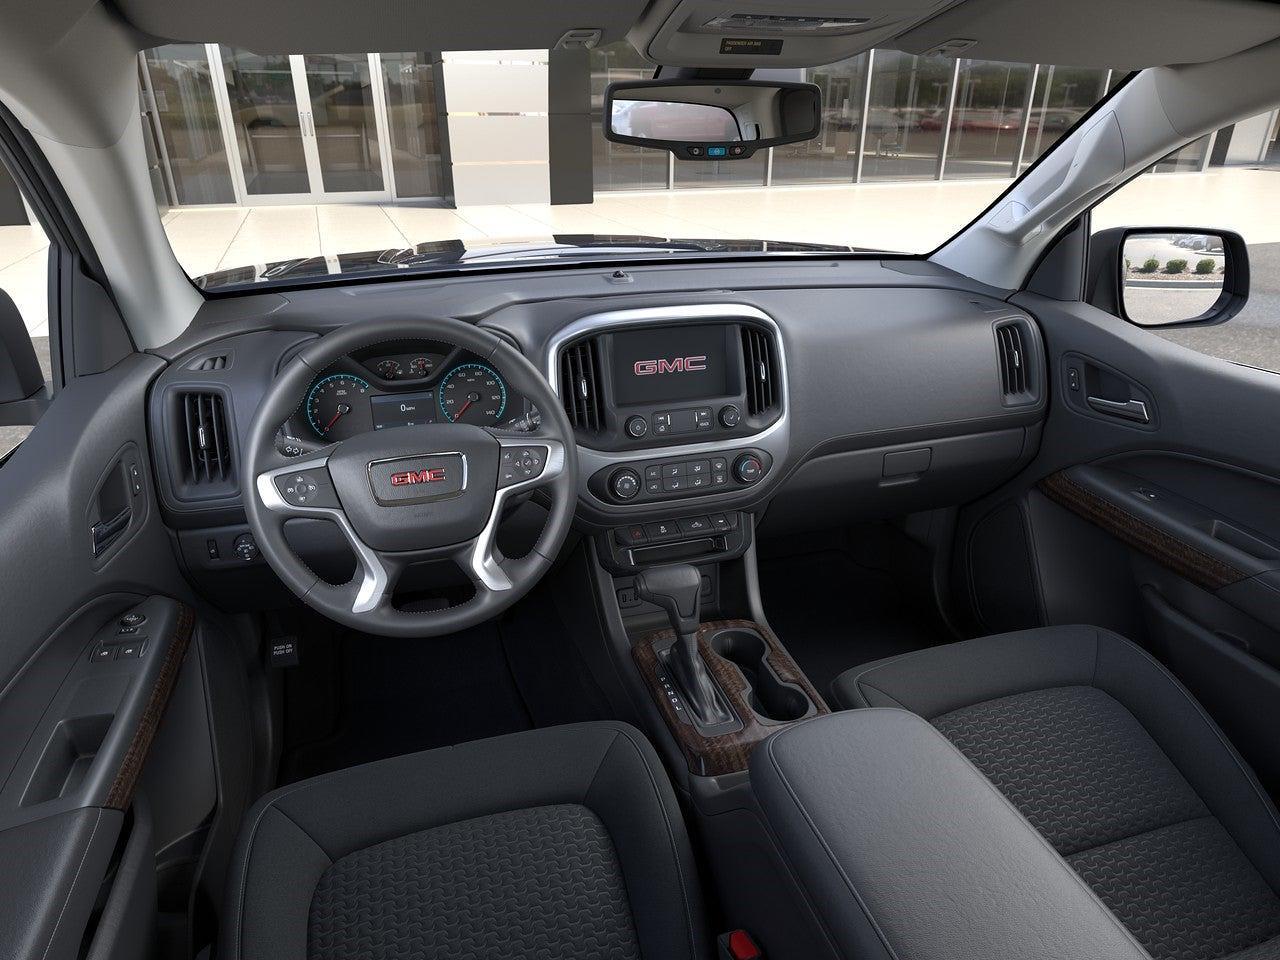 2020 GMC Canyon Extended Cab 4x2, Pickup #V20410 - photo 5